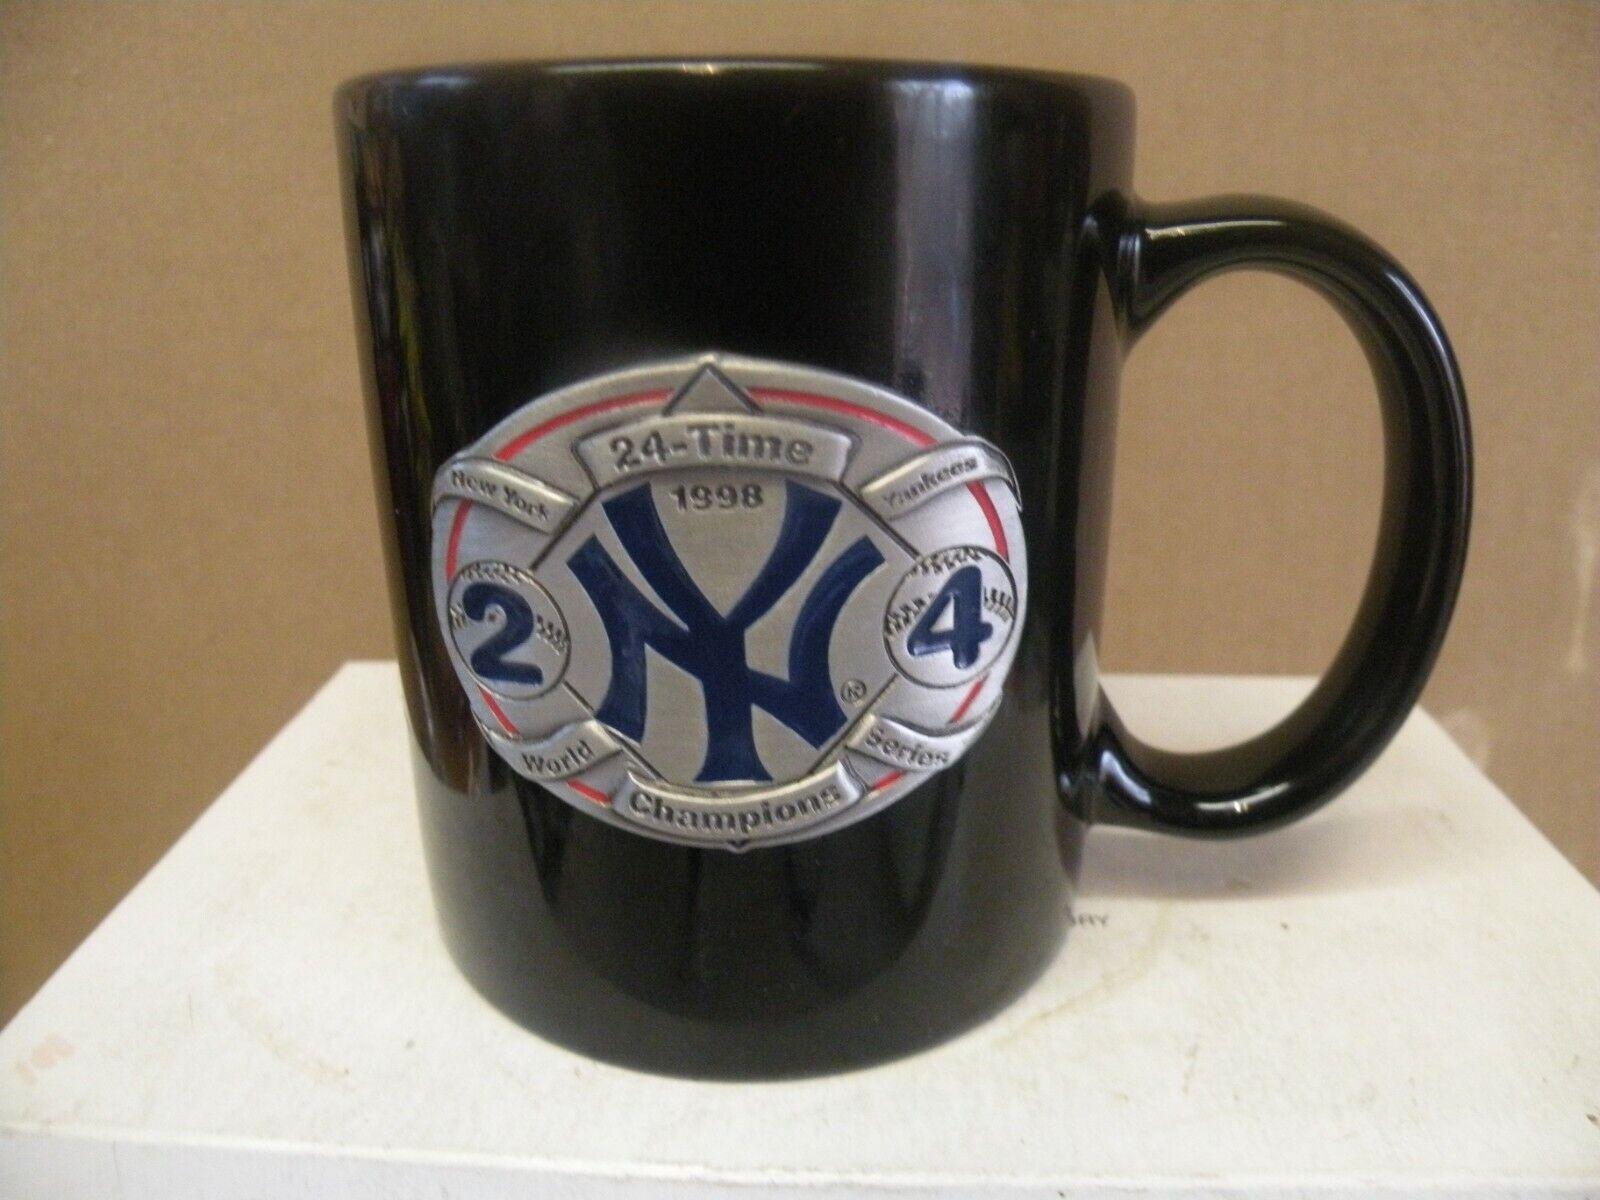 NEW YORK YANKEES 28 TIME WORLD CHAMPIONS COFFEE MUG - $12.00